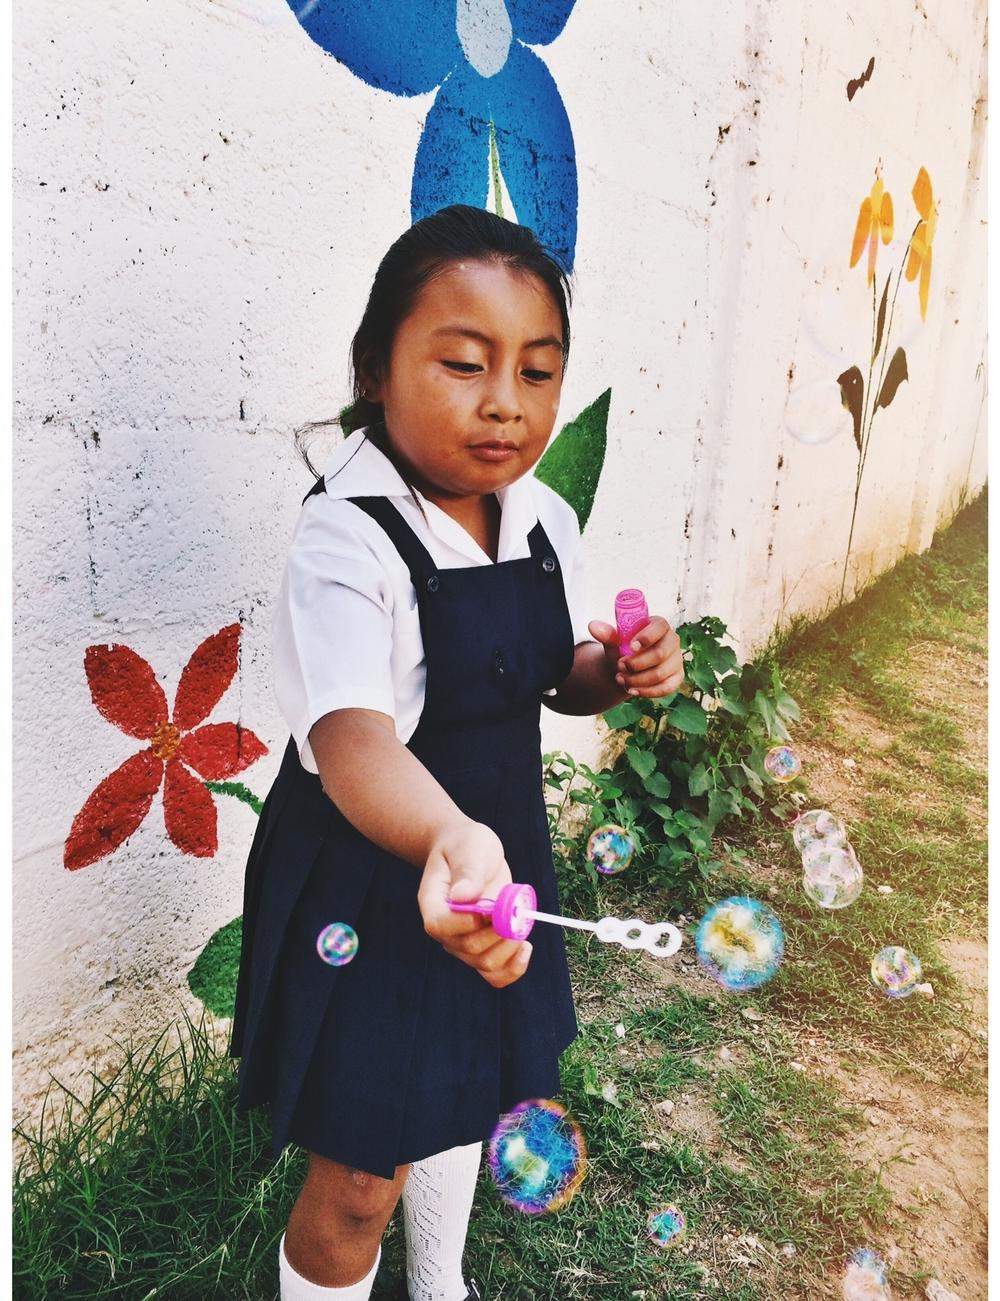 Rosemari - down syndrome student guatemala